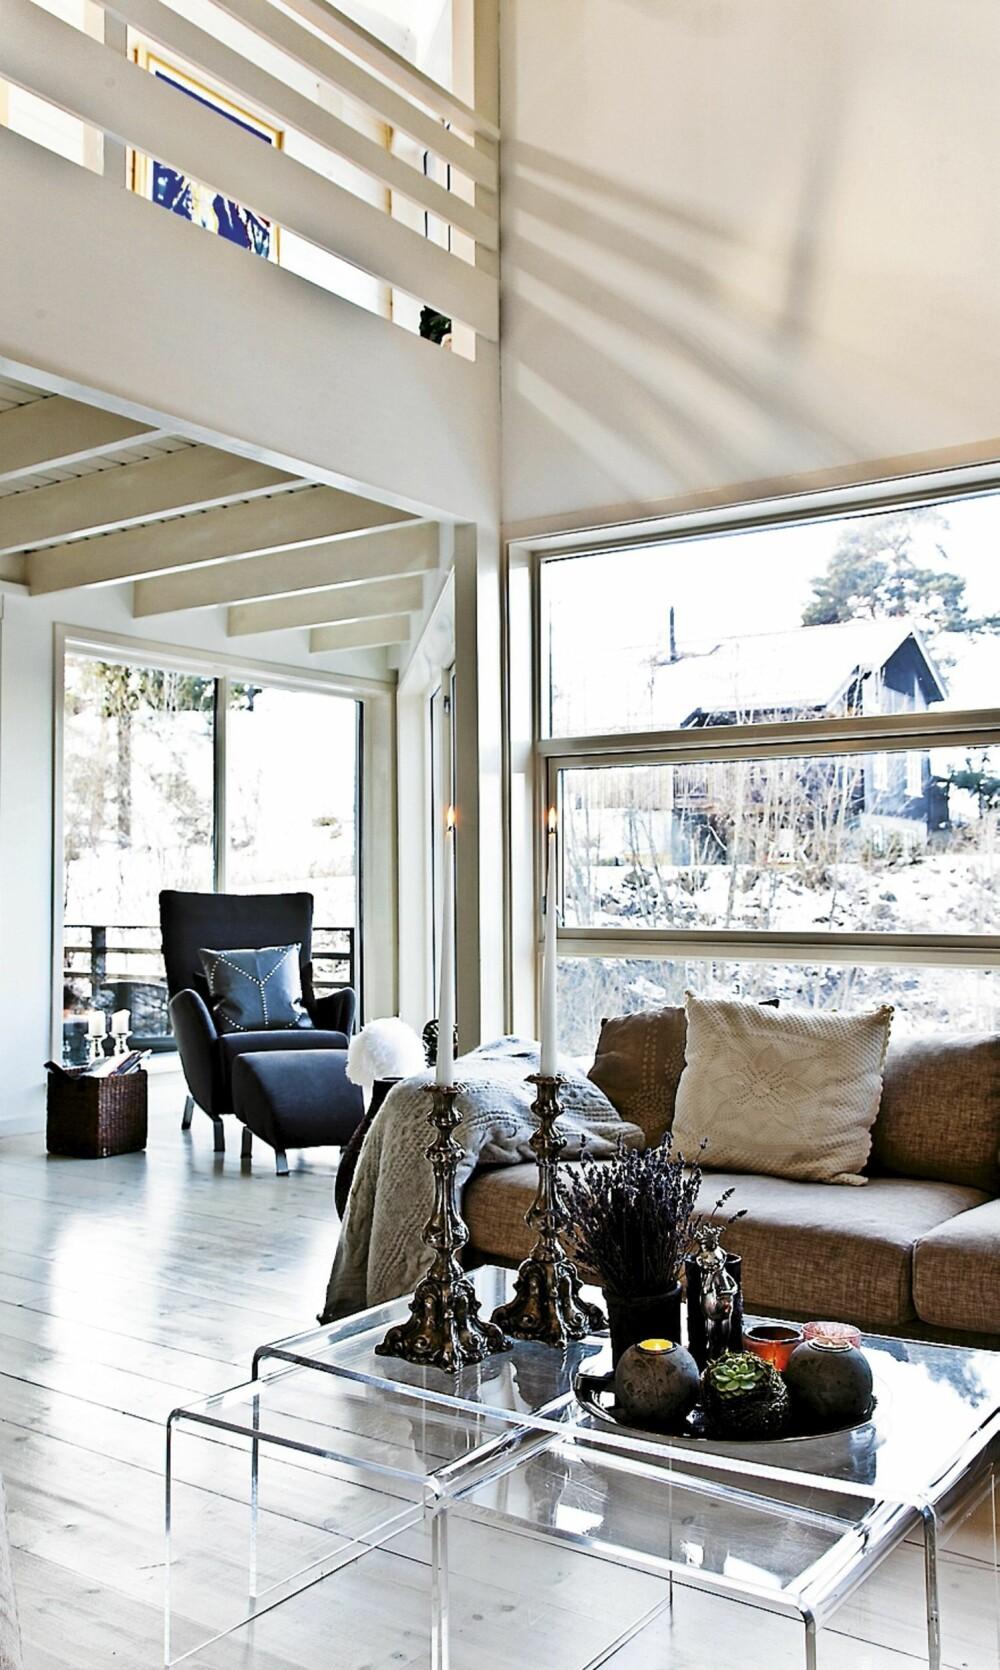 LUFTIG. Store vindusflater og spennende vinkler gir boligen en luftig og åpen atmosfære.